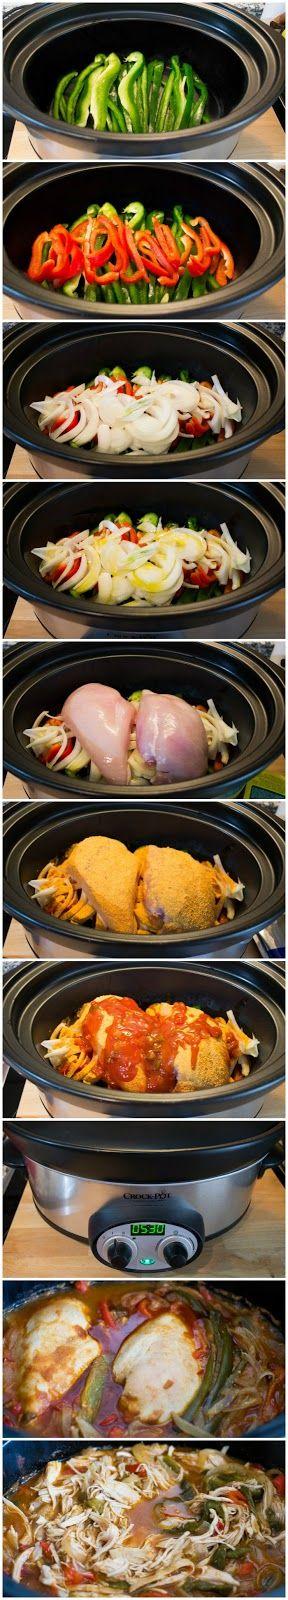 Fajitas de pollo Tex-Mex (con Crock Pot)